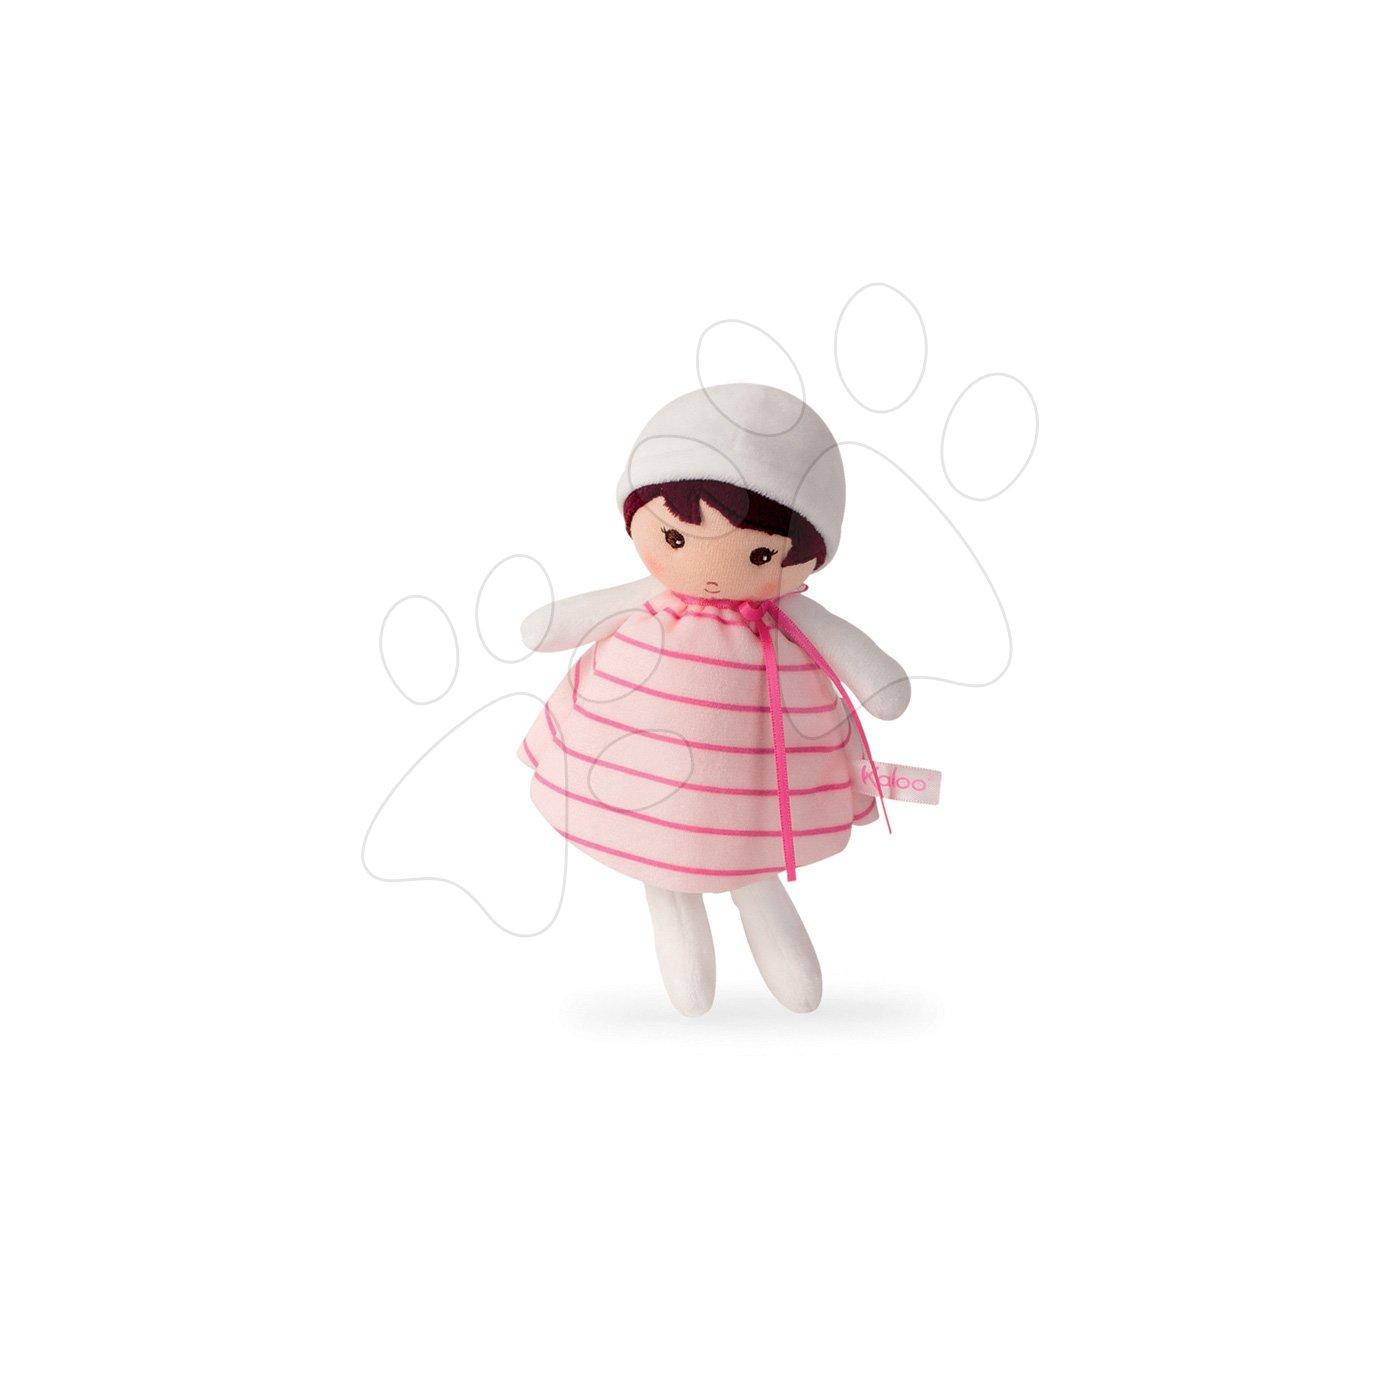 Kaloo bábika pre bábätká Rose K Tendresse 18 cm v pásikavých šatách z jemného textilu v darčekovom balení 962093